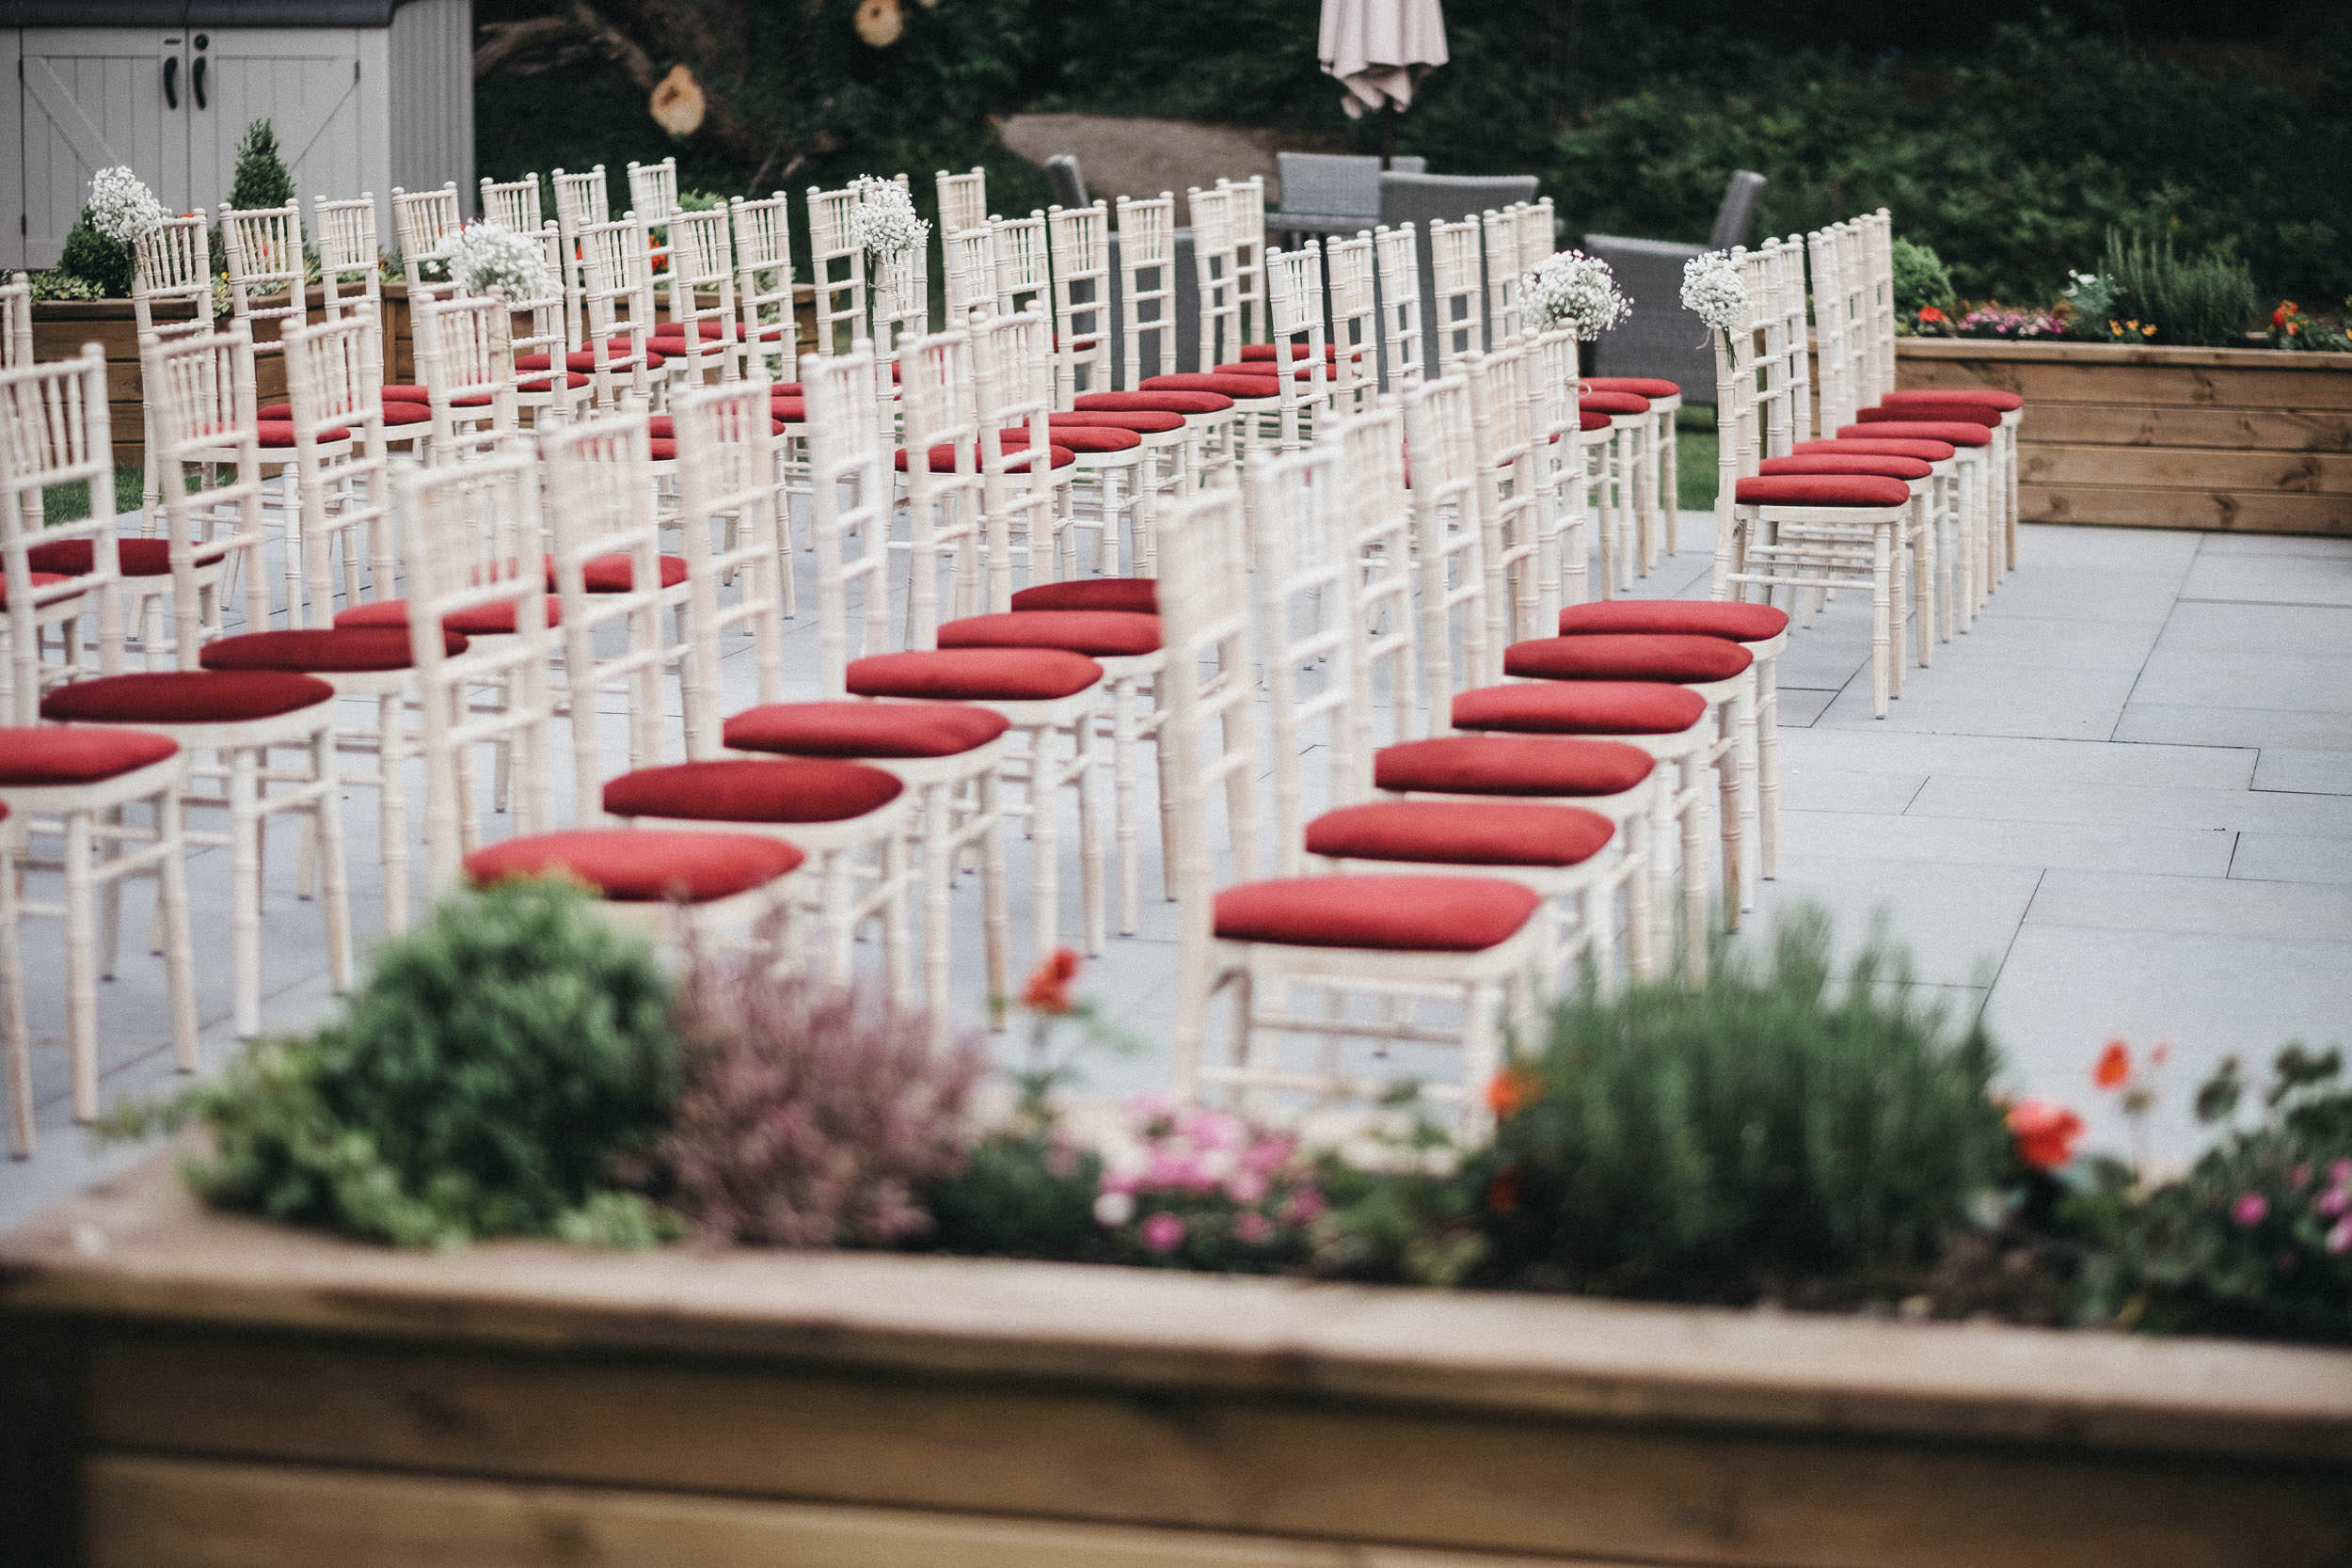 Chairs set up for outdoor wedding at Judges at Kirklevington